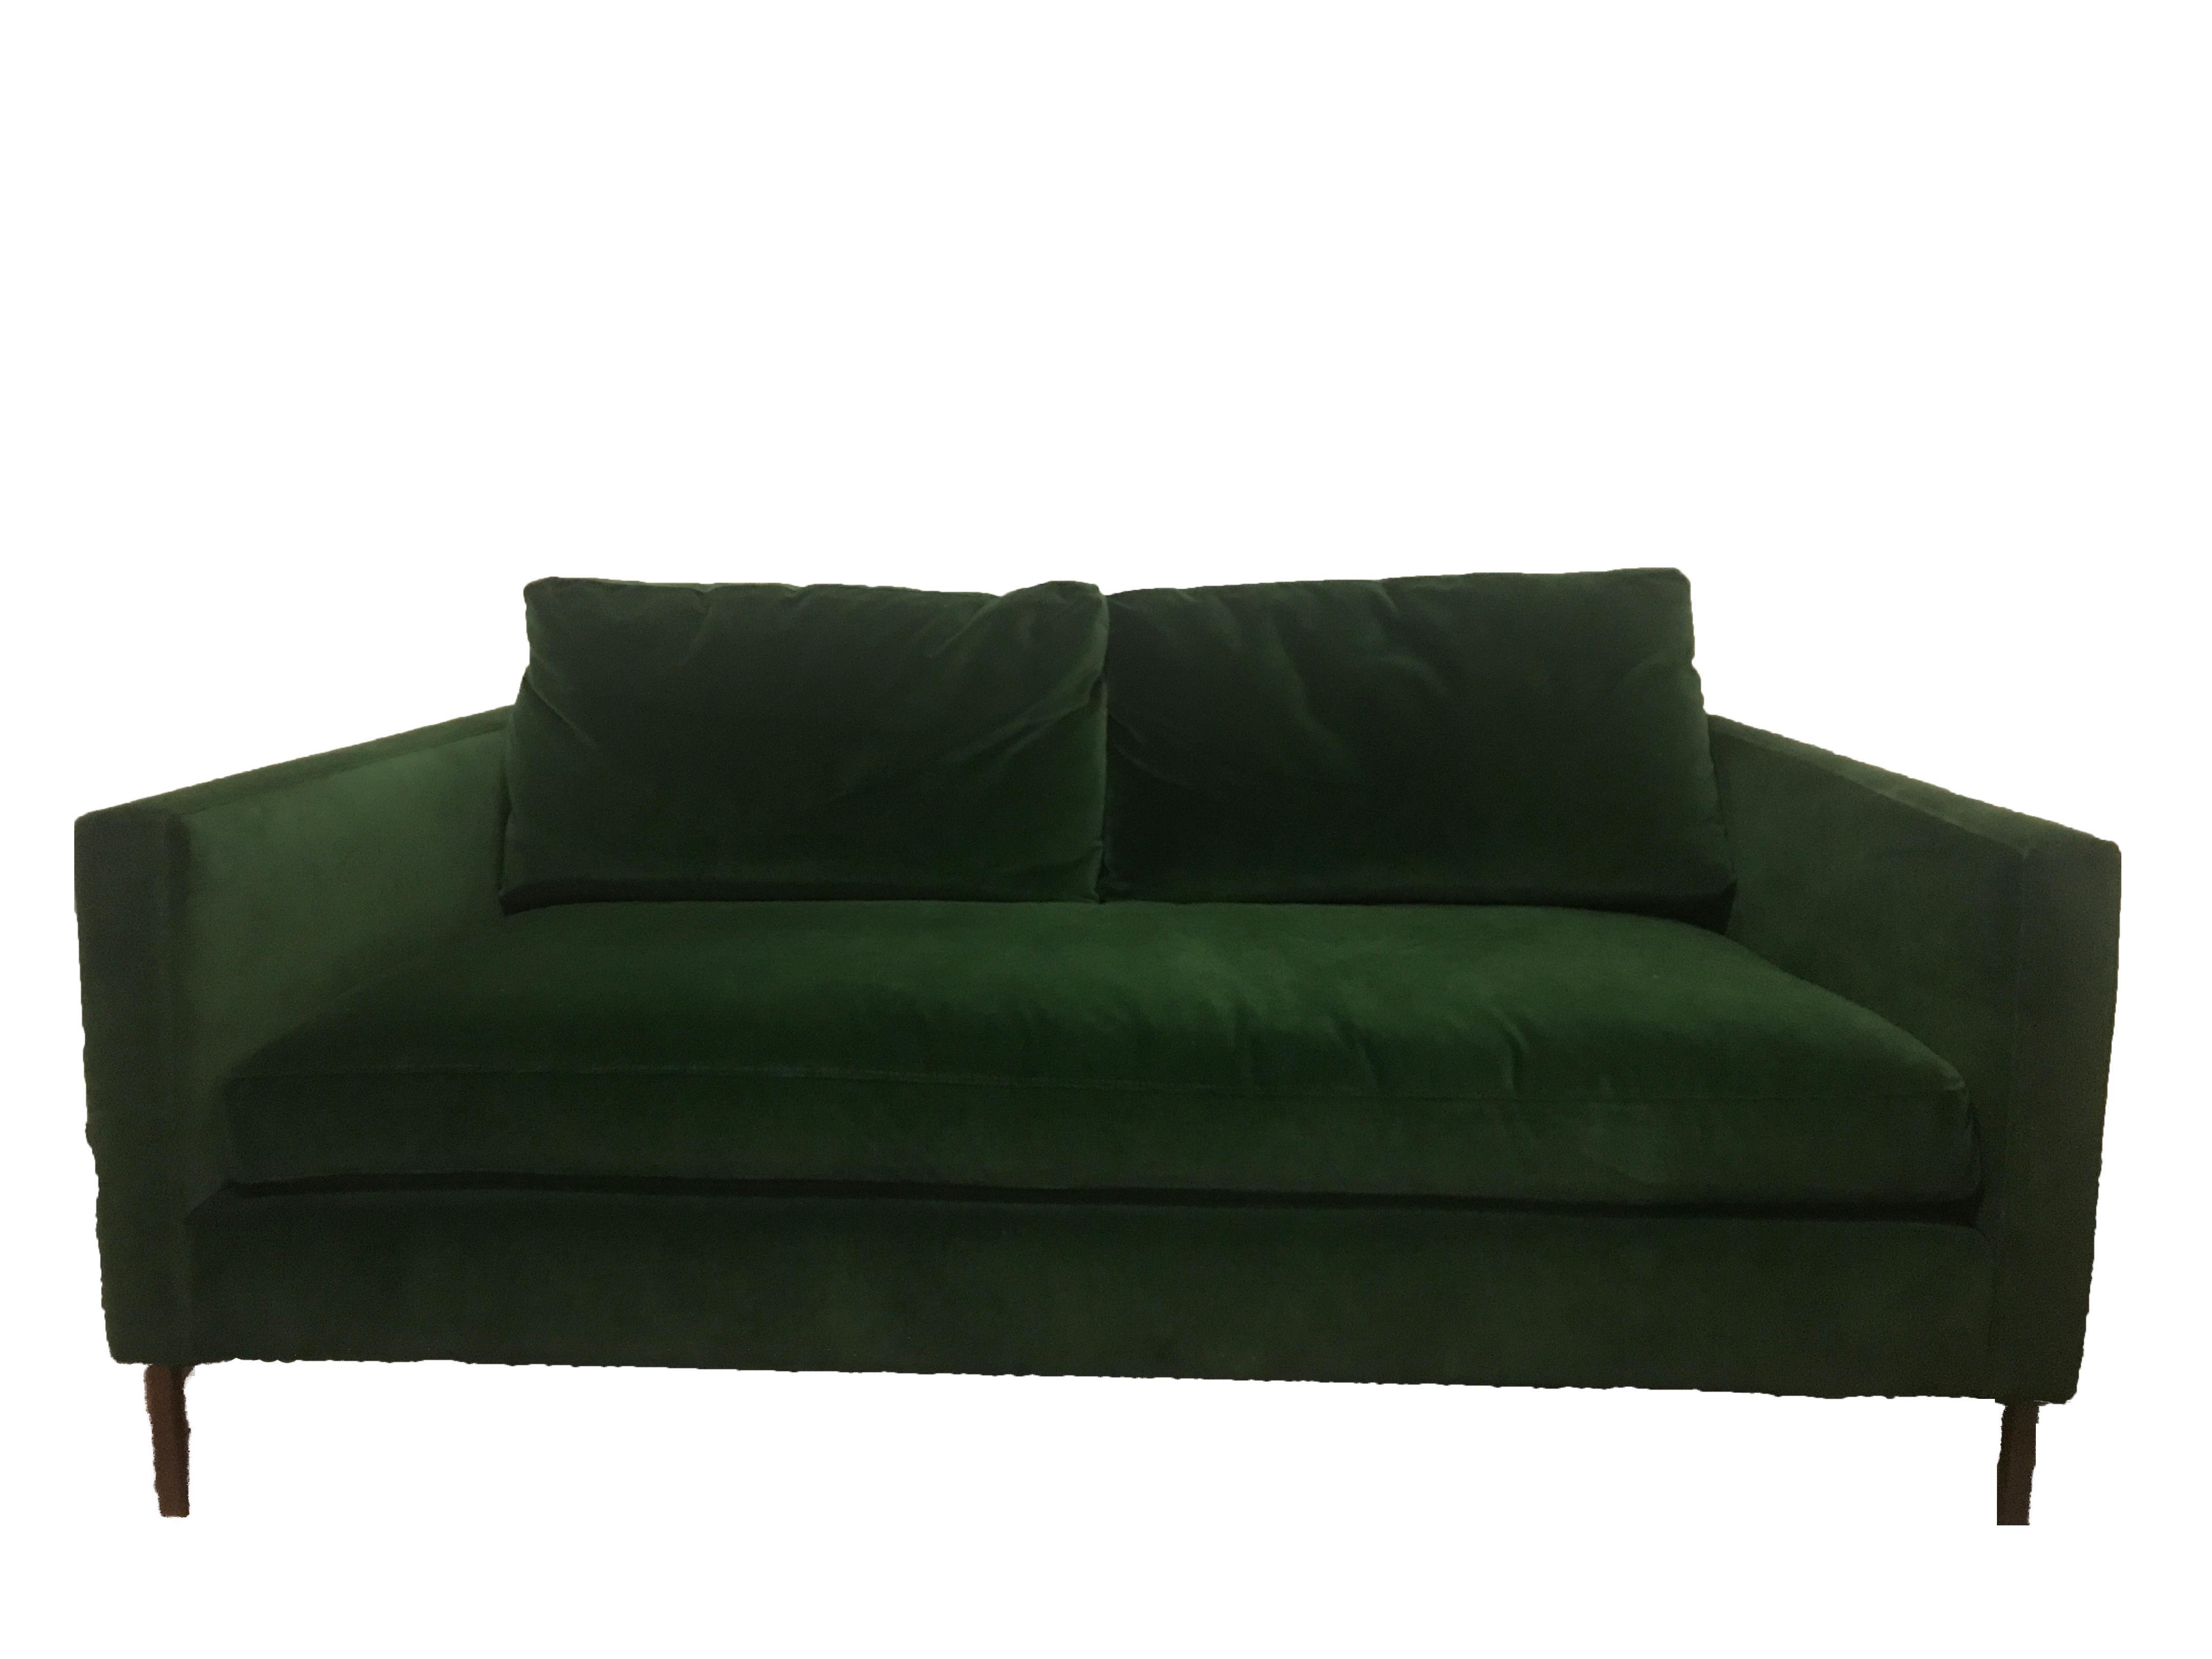 green emerald coach costco stationary couch plush loveseat beachbody pillow casual pay velvet sofa